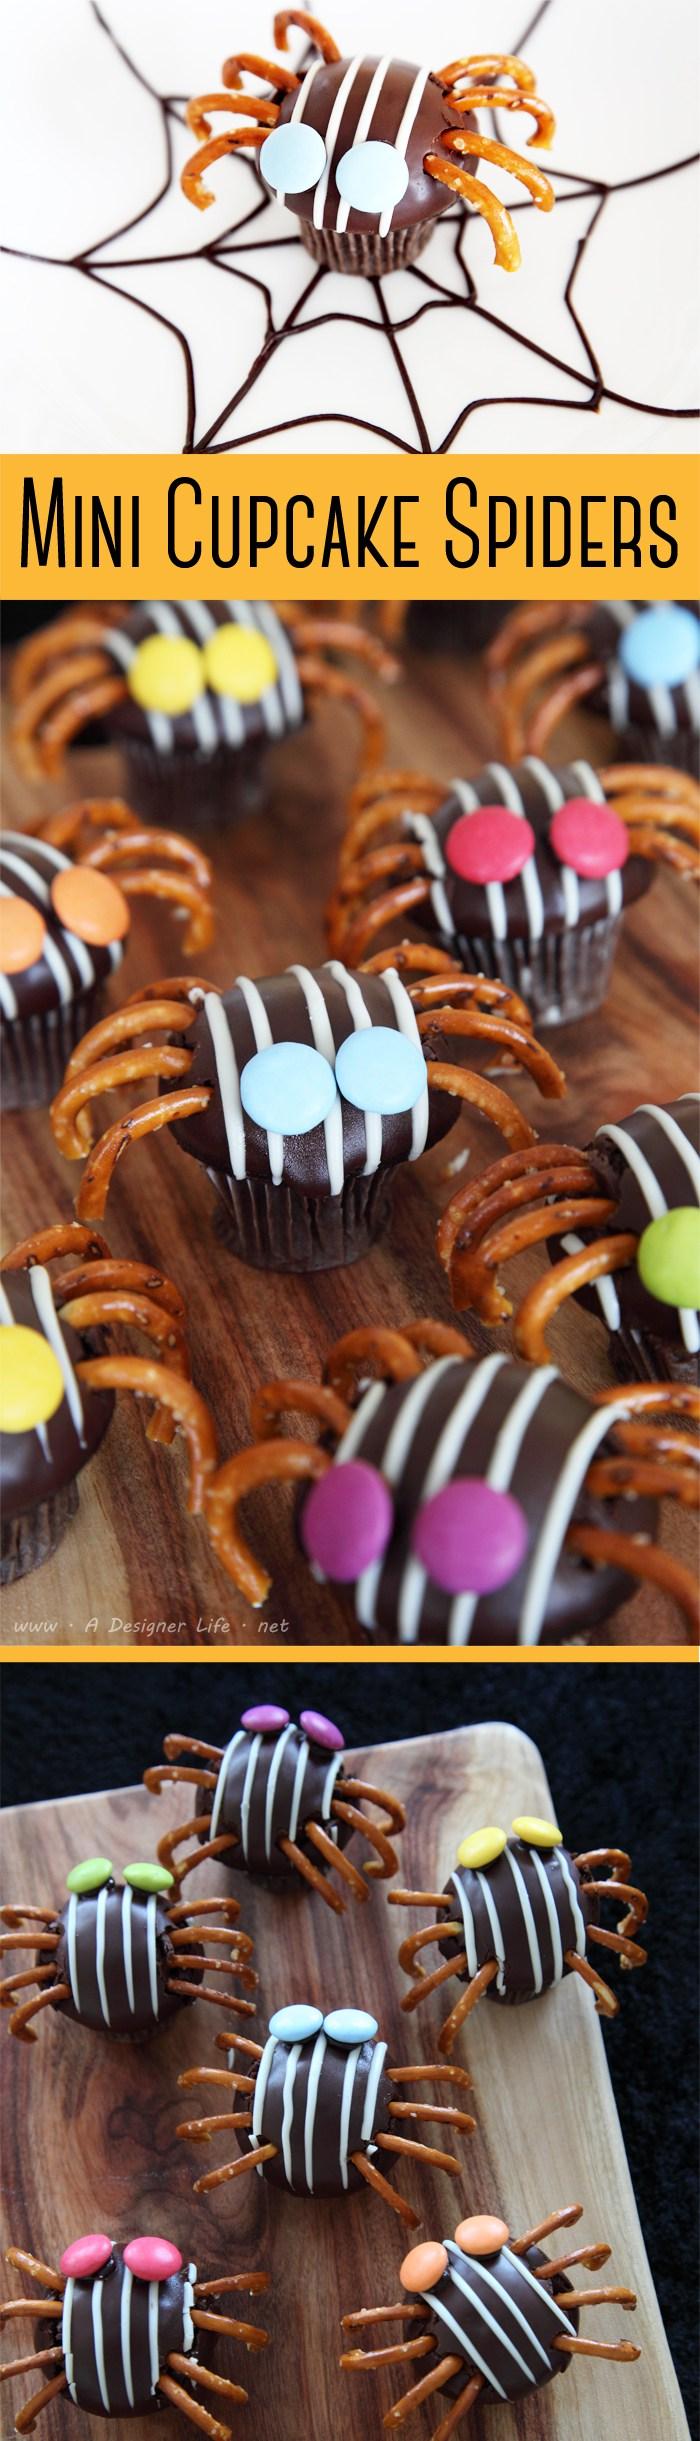 mini-cupcake-spiders-j-dunn